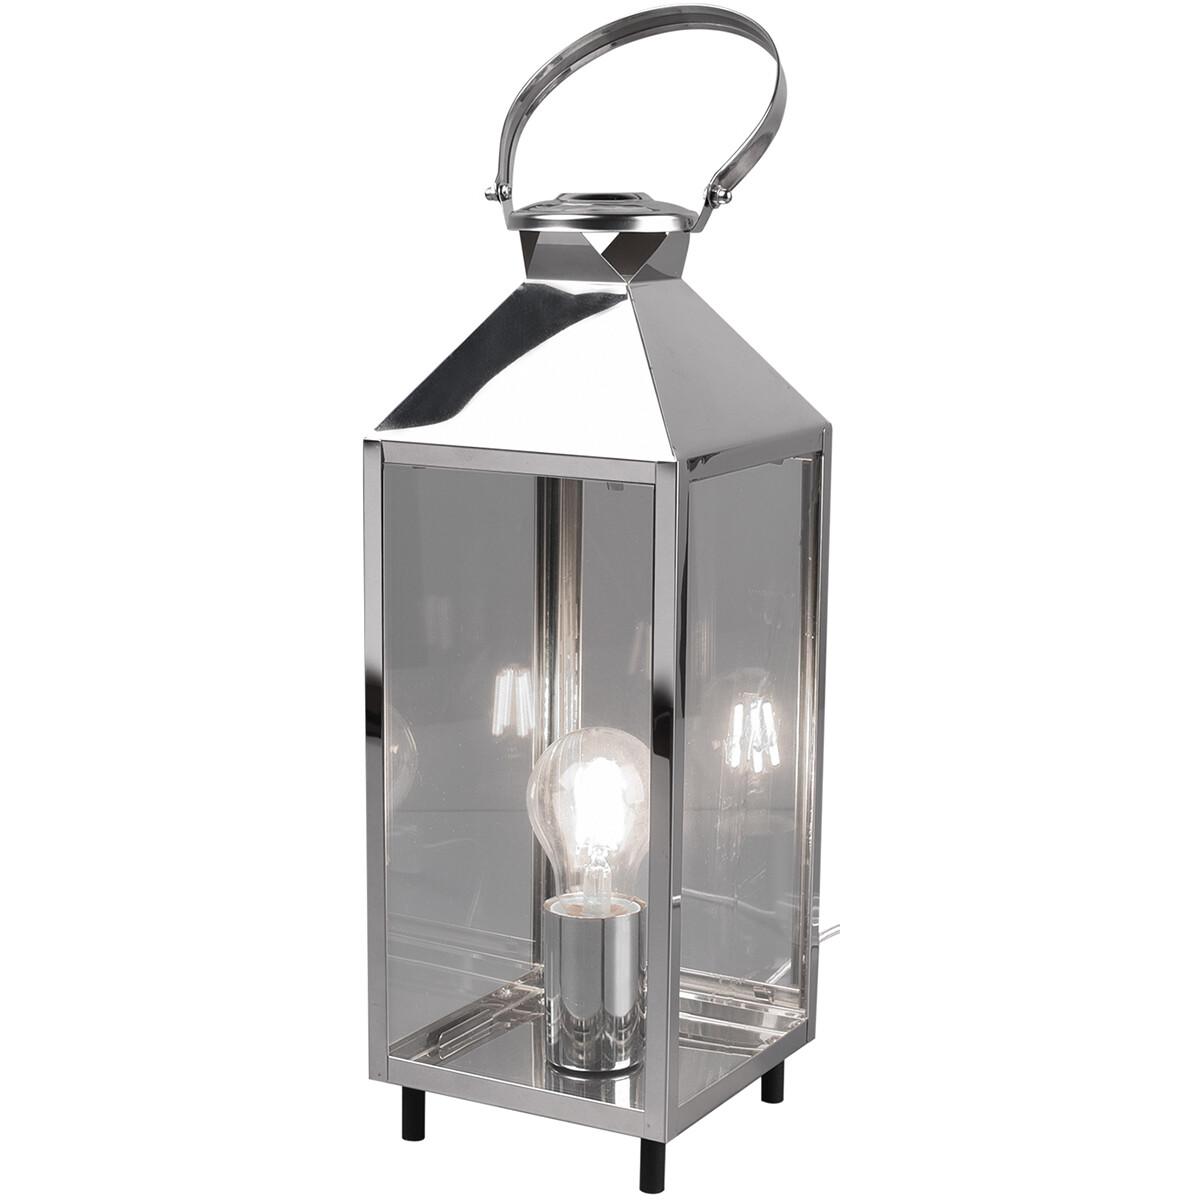 LED Tafellamp - Tafelverlichting - Trion Fala - E27 Fitting - Rechthoek - Mat Chroom - Aluminium